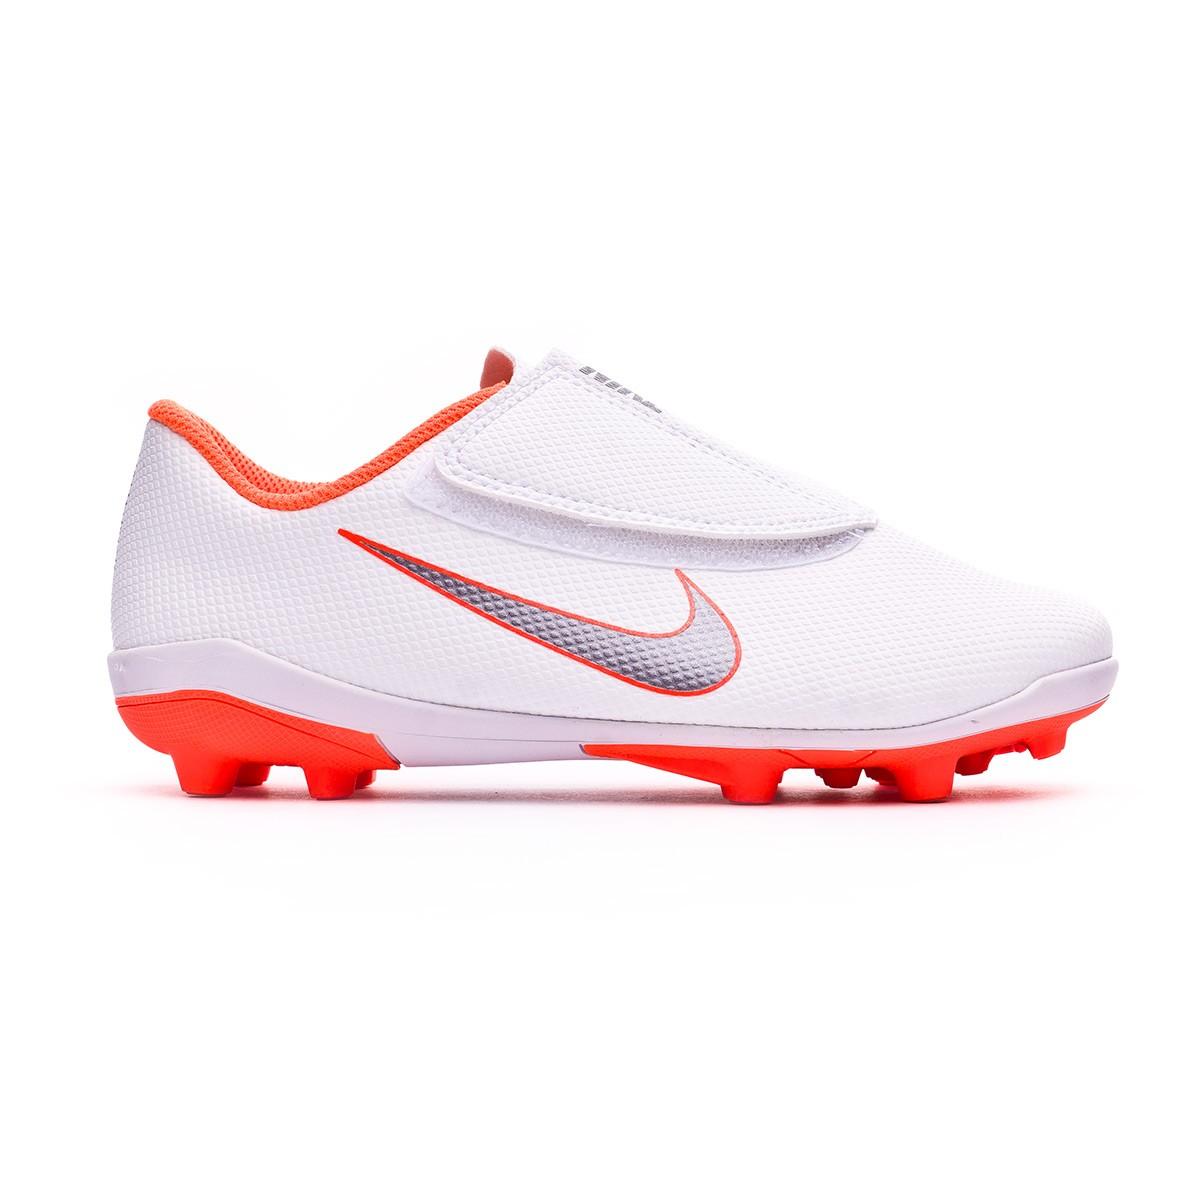 4c2c02a0323 Football Boots Nike Kids Mercurial Vapor XII Club PS Velcro MG  White-Metallic cool grey-Total orange - Tienda de fútbol Fútbol Emotion